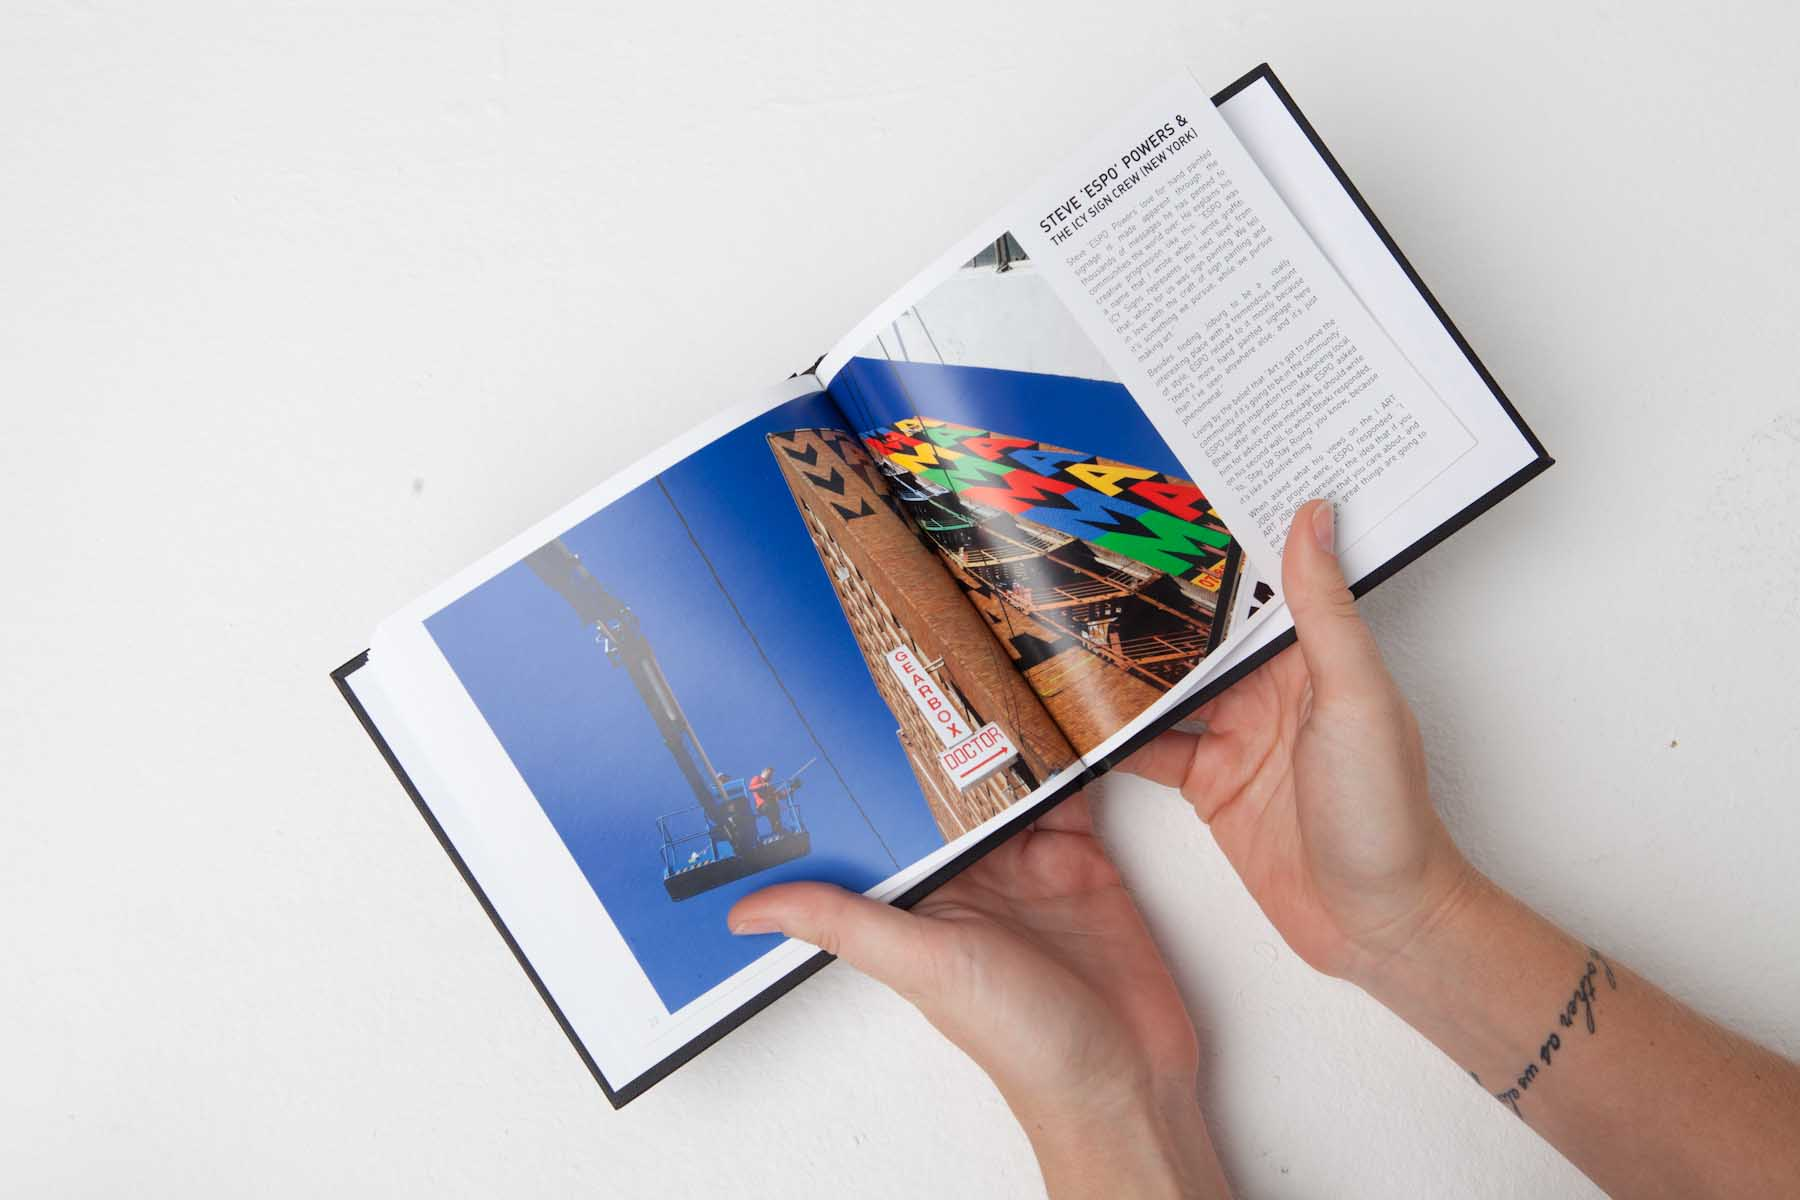 ADIDAS_IART JOBURG_KimTerriSmith_Book_19.jpg